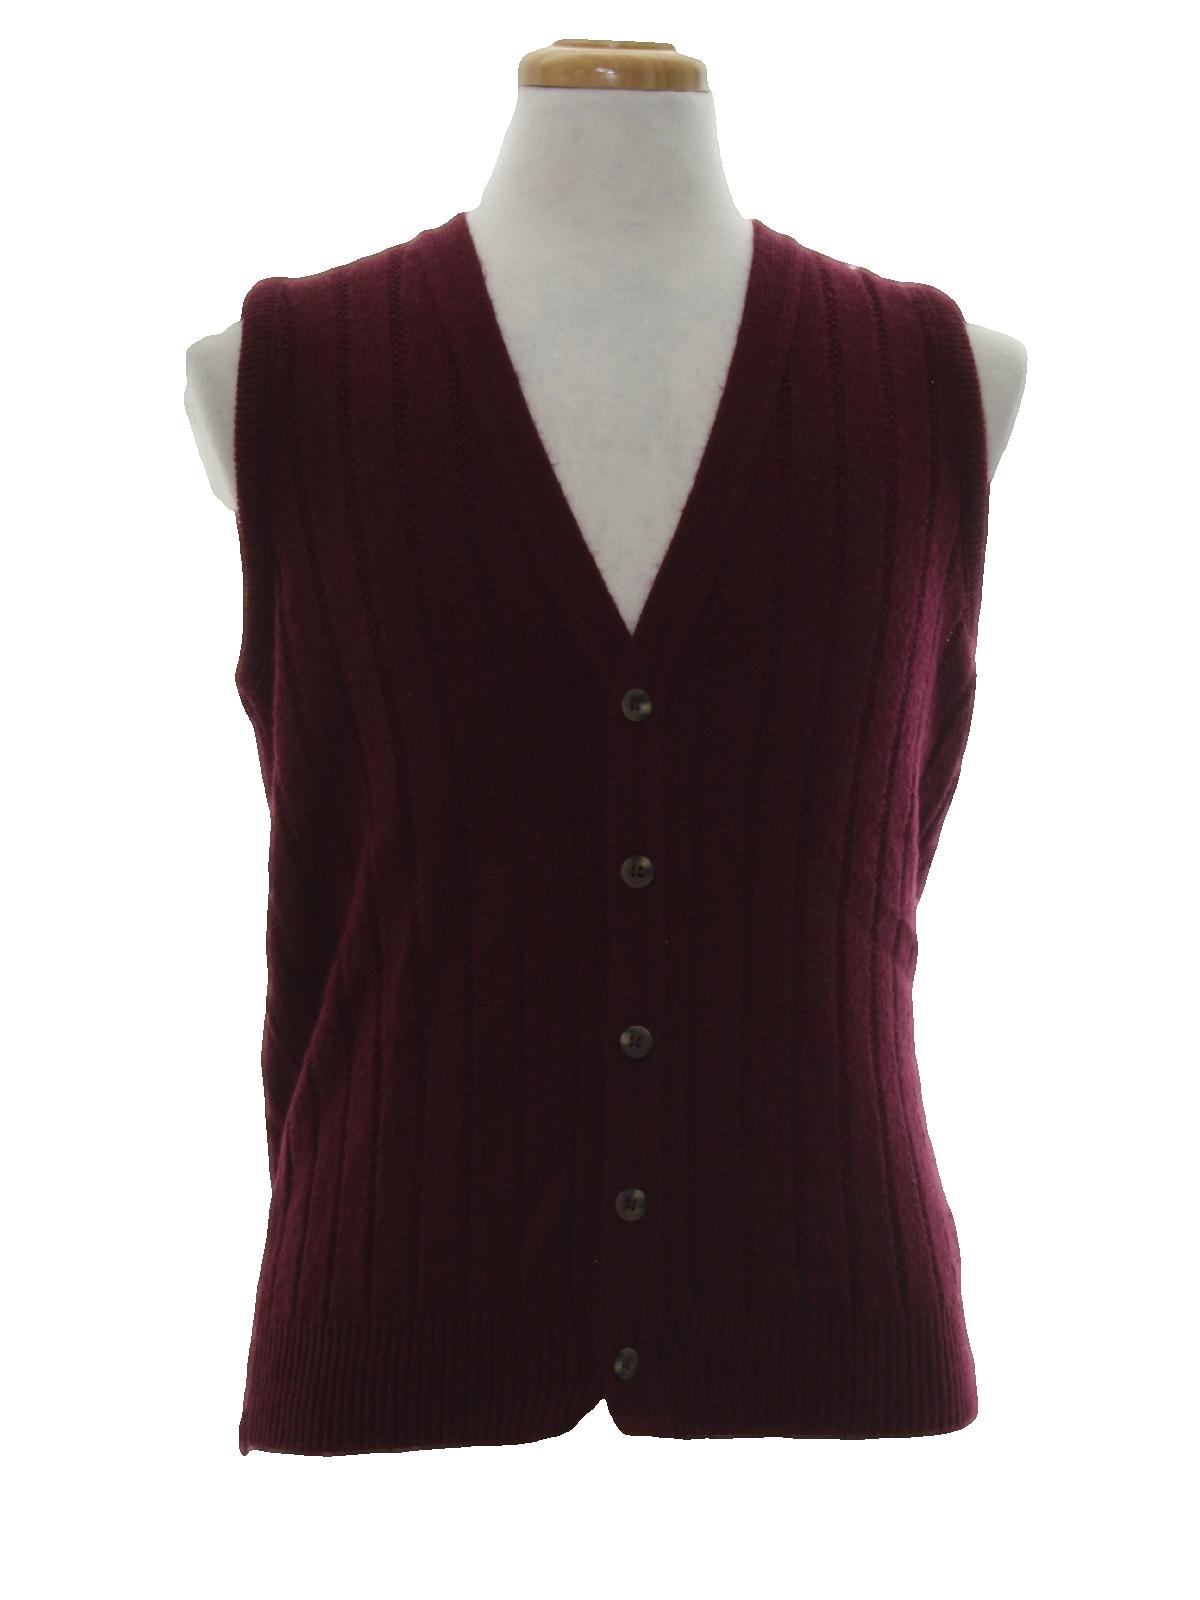 80s Retro Sweater: 80s -Ingrams Mens Shop- Mens burgundy stripe ...